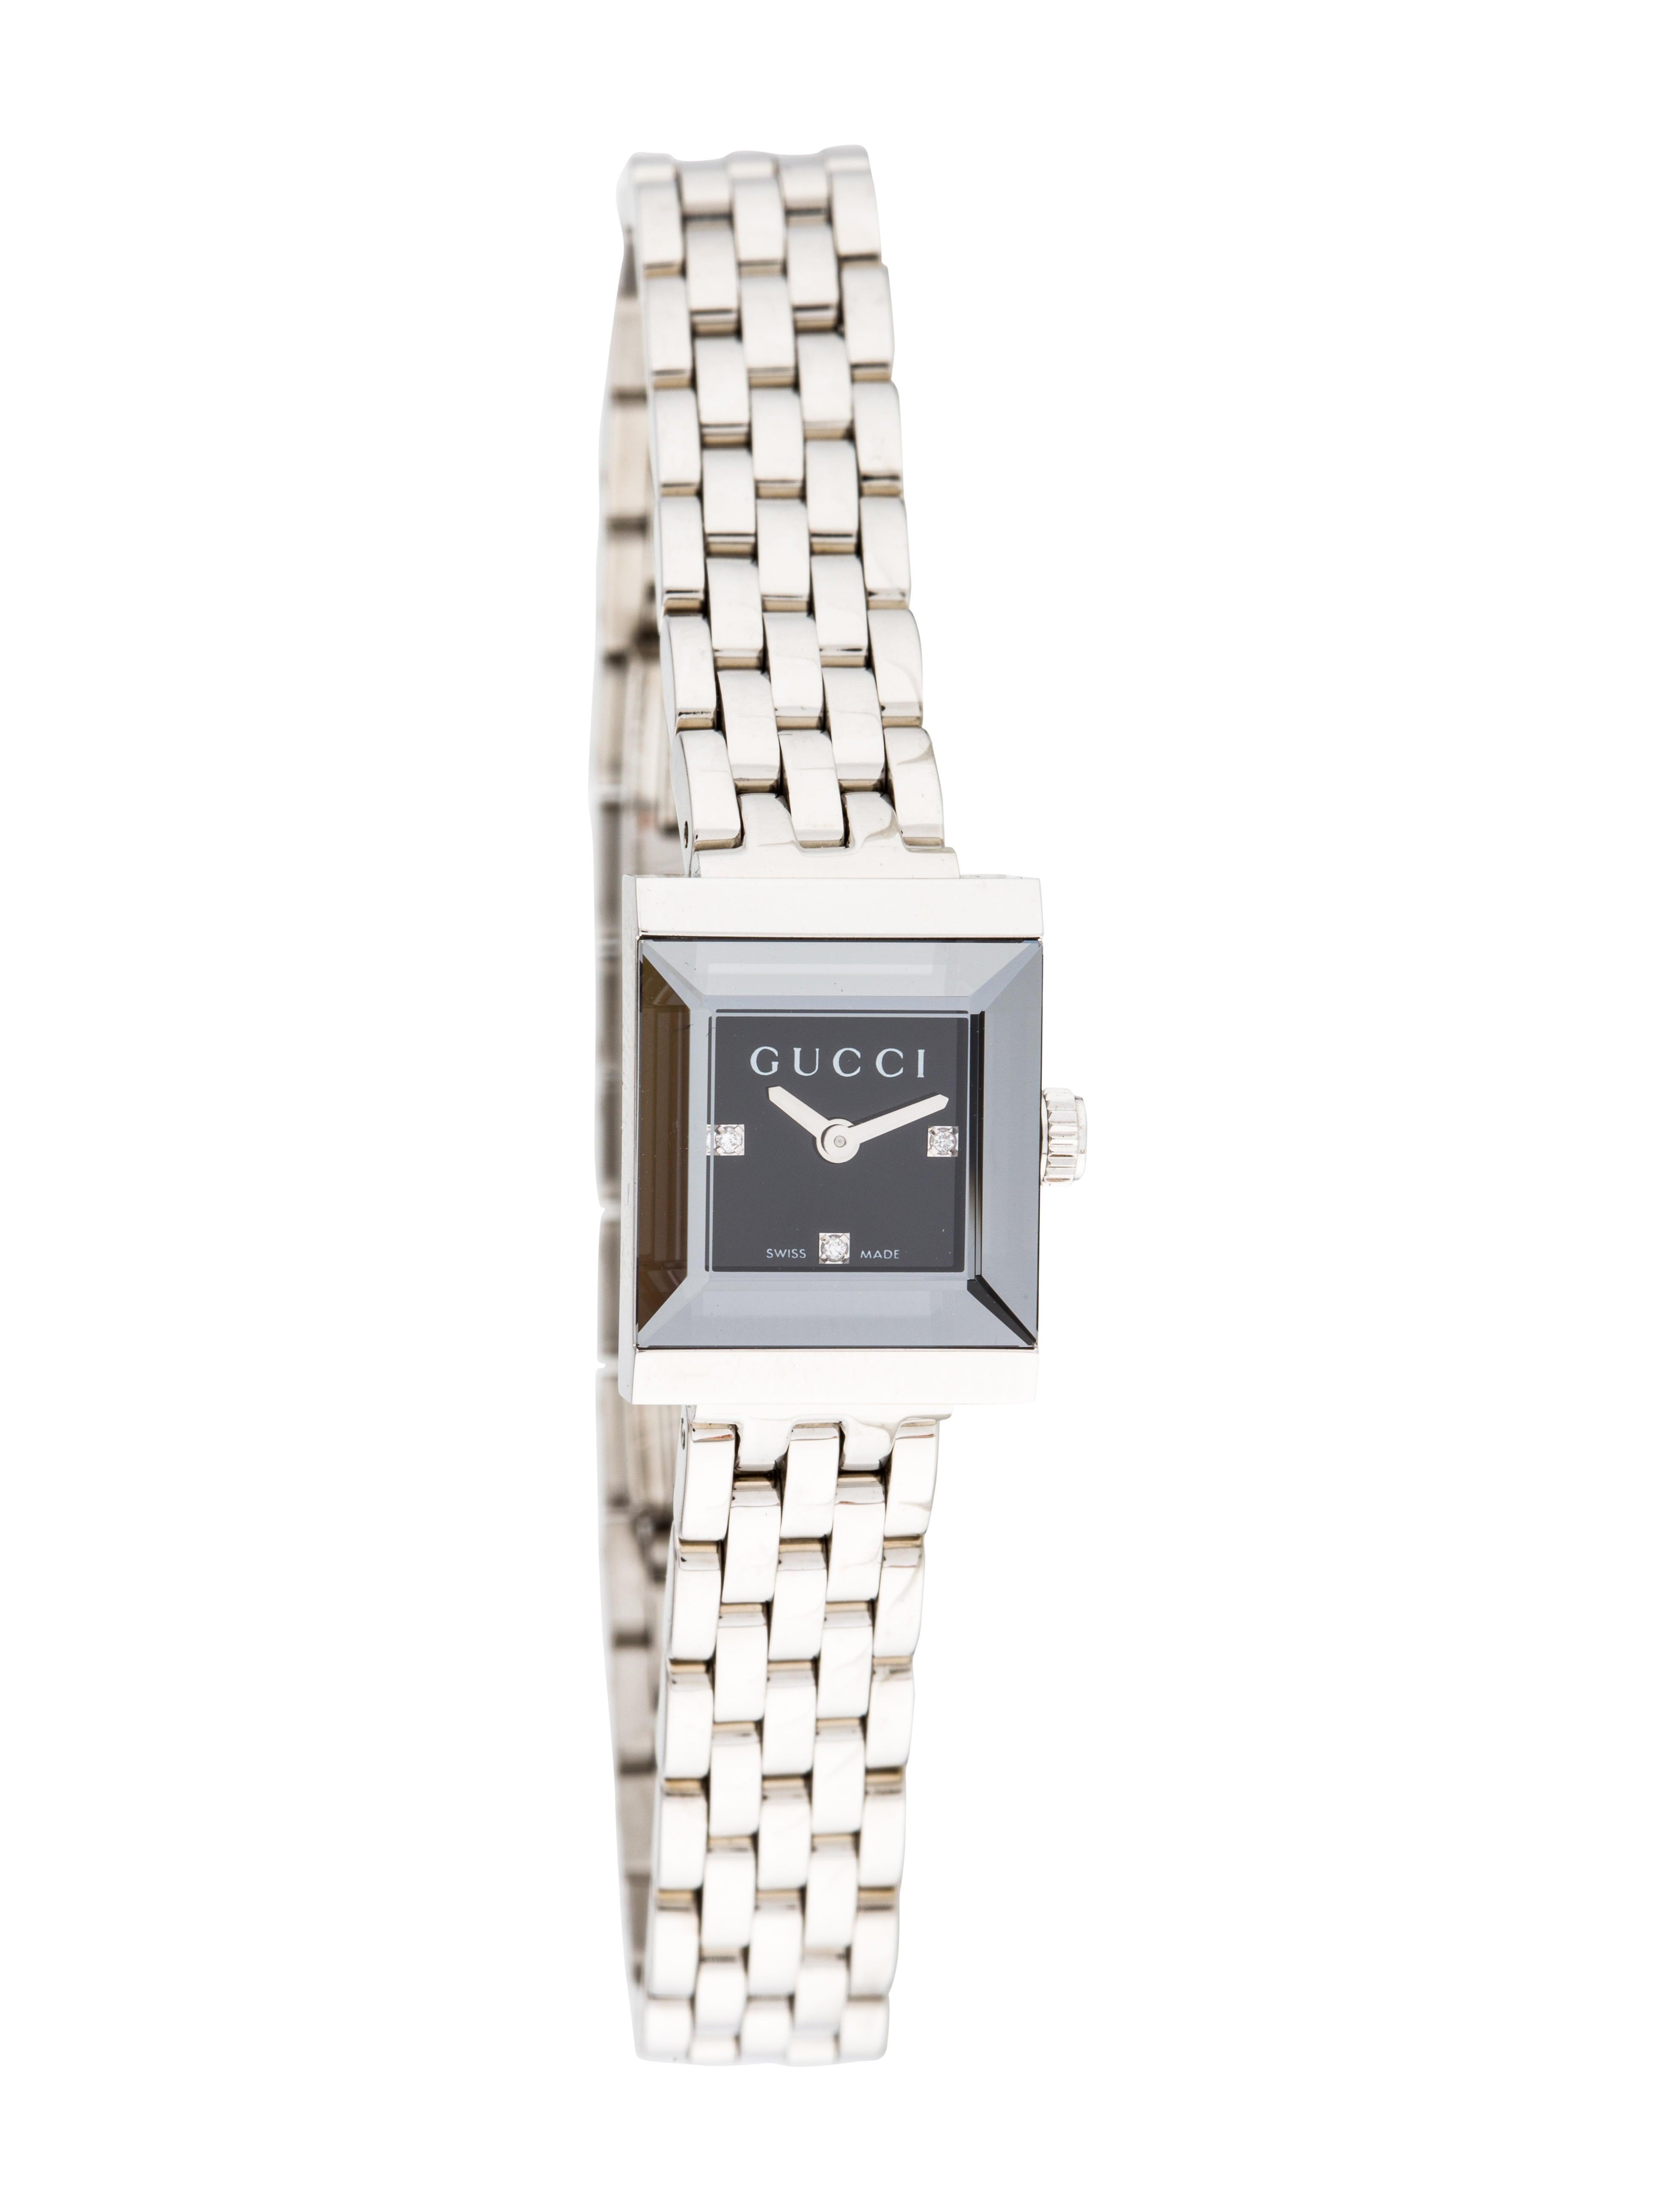 464c08049f4 Gucci G Frame Watch - Bracelet - GUC208921